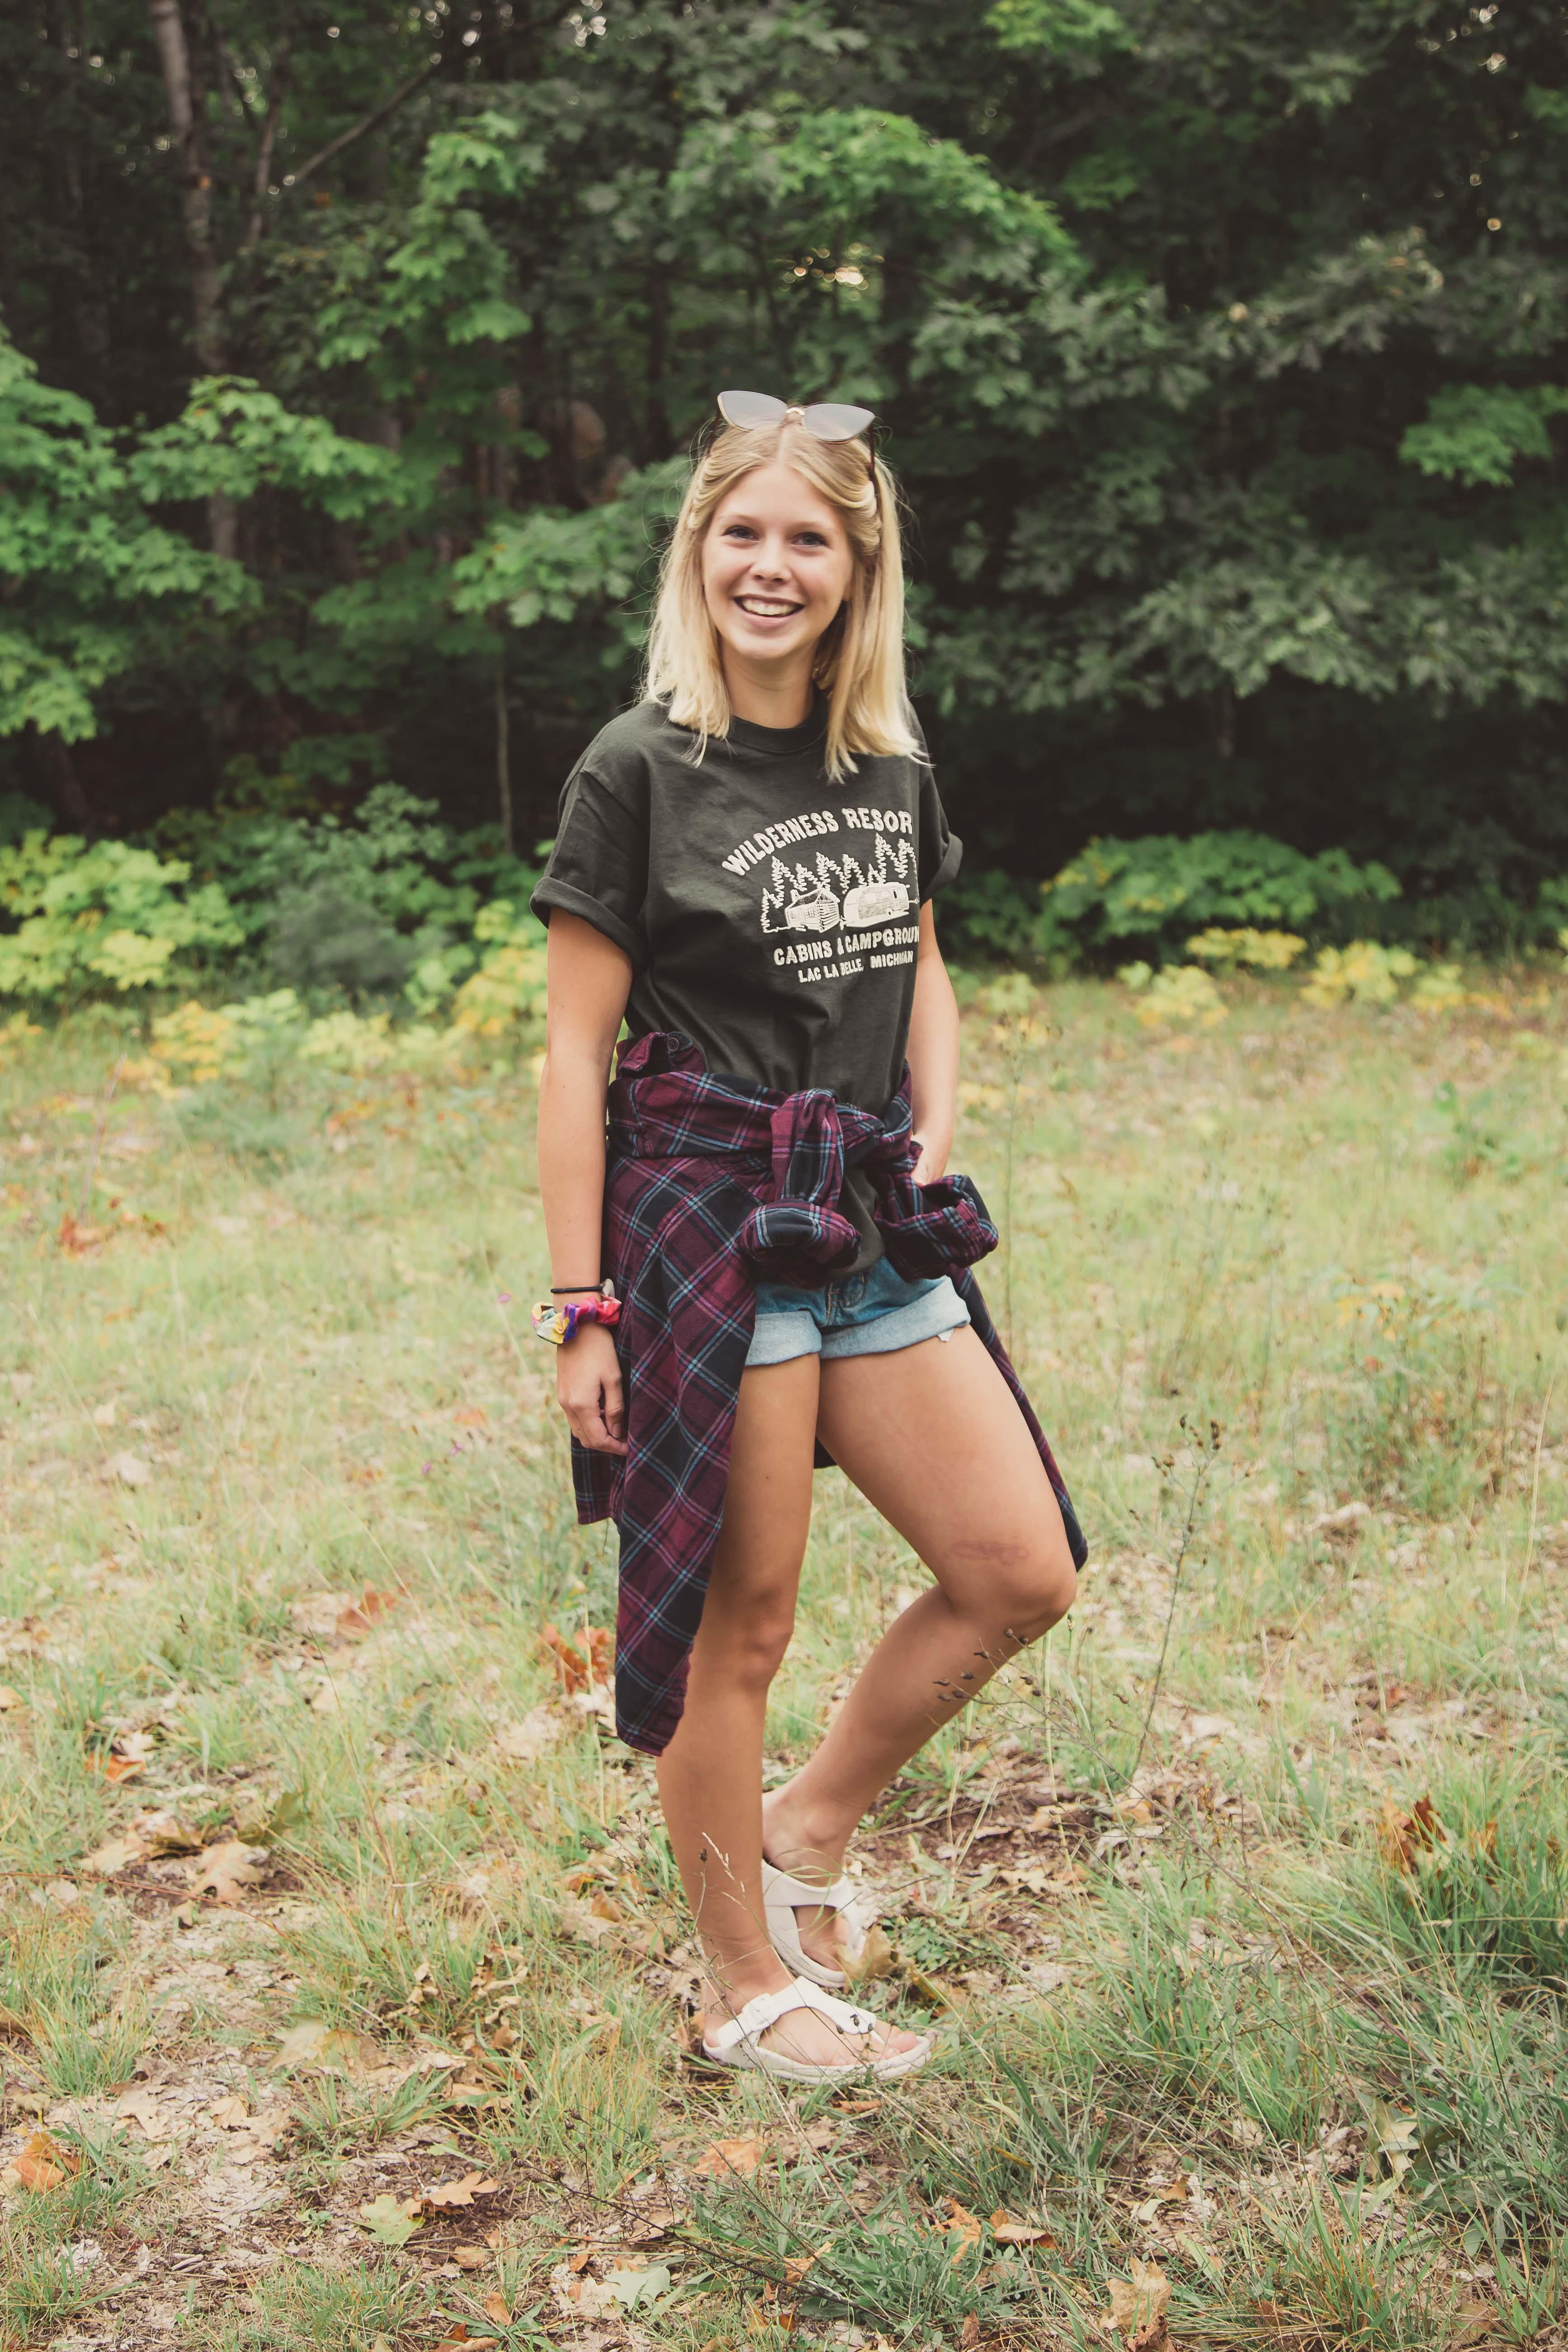 Wilderness Resort LLC Apparel Hunter Green Short Sleeve T-Shirt on Model Maddy